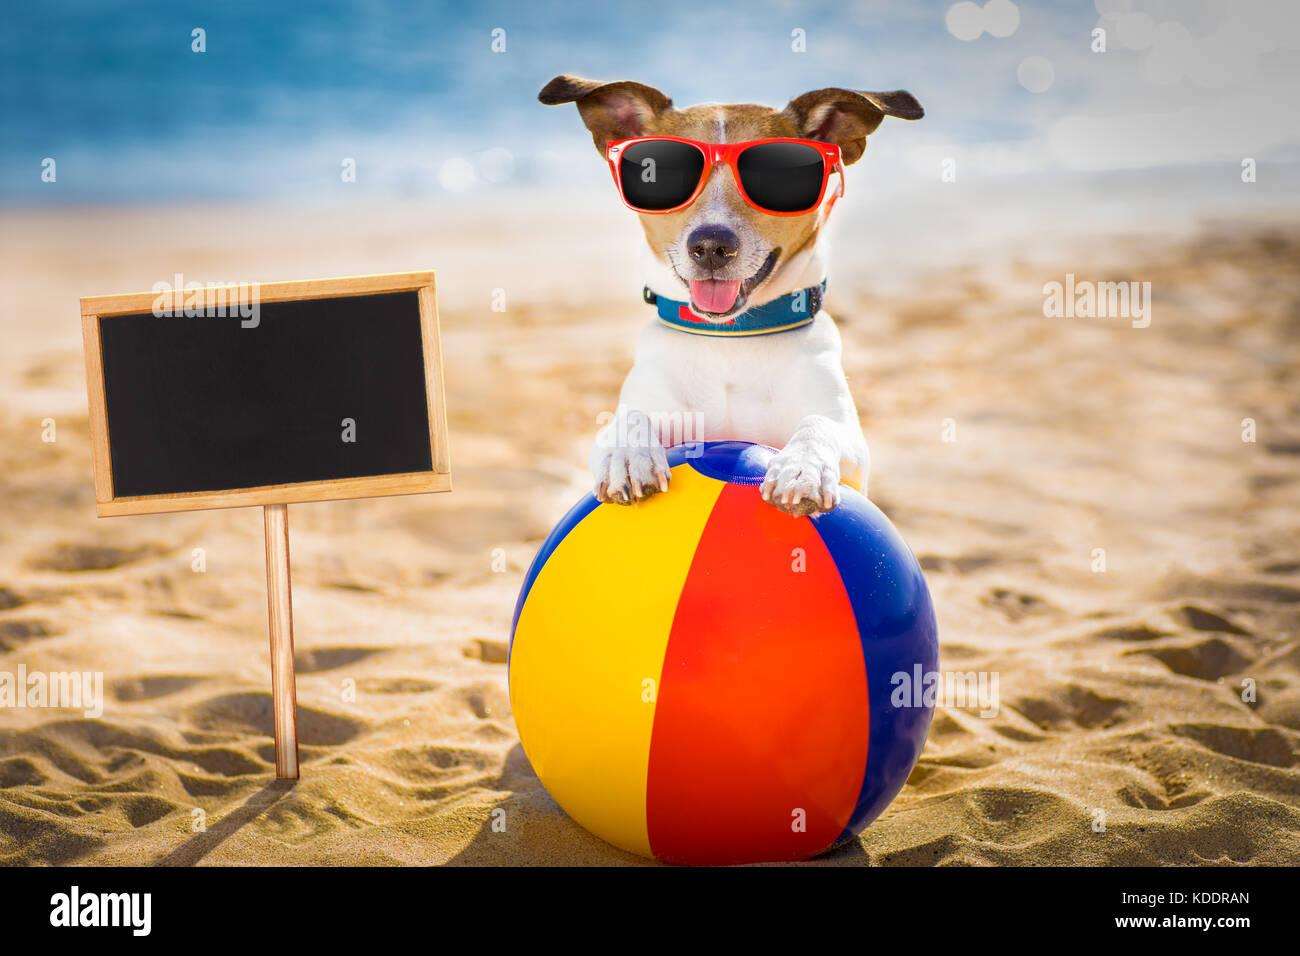 Strand ShoreIm Hund Sommerurlaub Russel Jack Am Ocean SMqzUVpLG